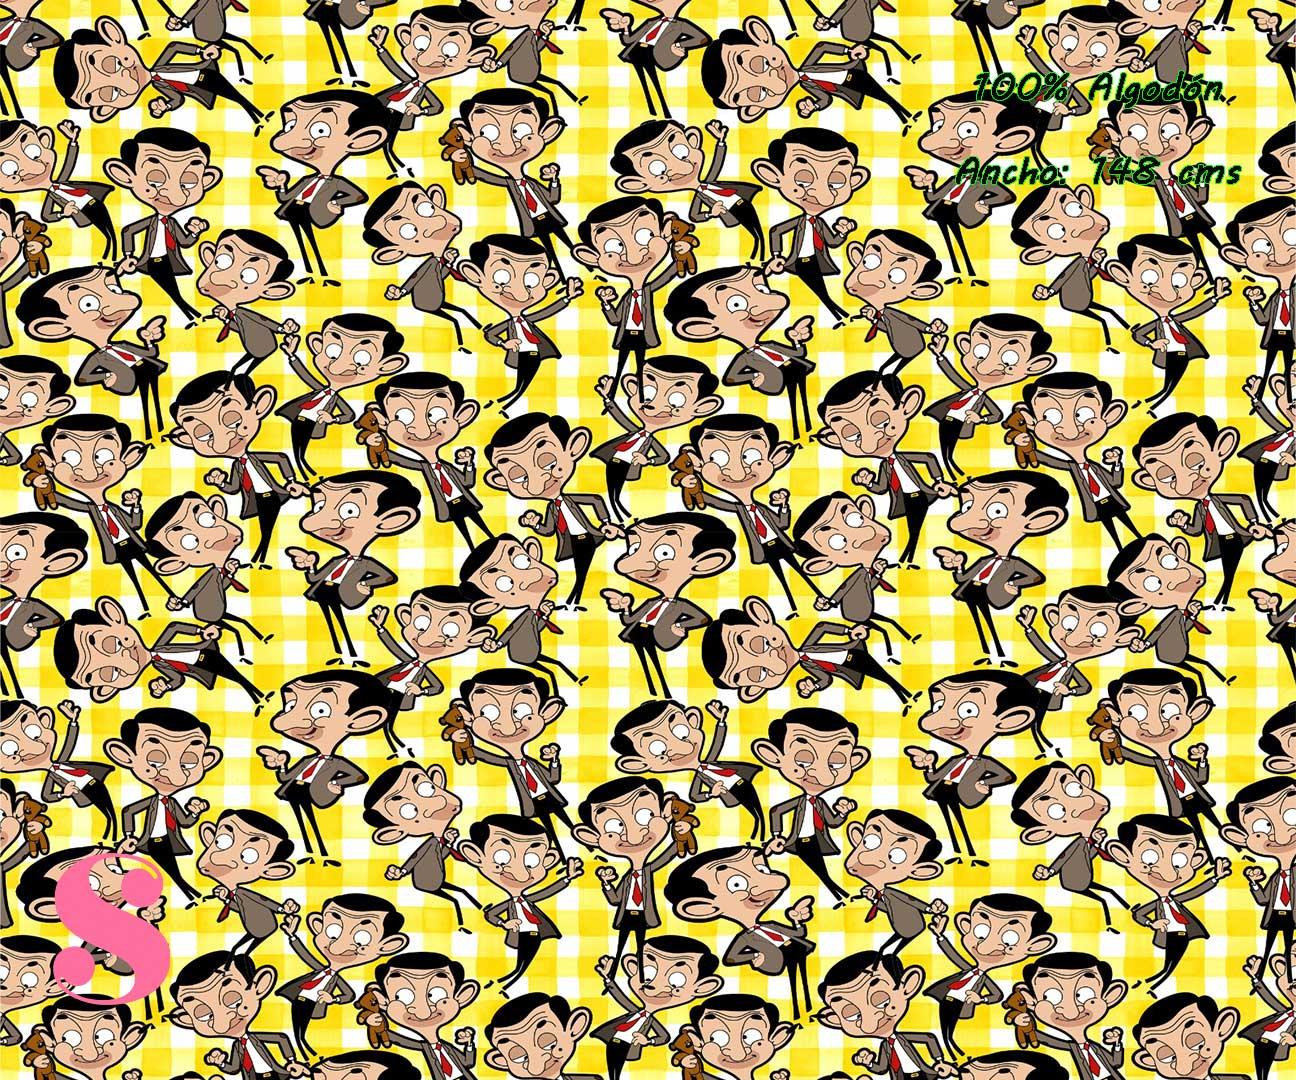 1-telas-frikis,estampados-frikis,tela-de-algodón-estampada-de-moda,estampados-originales,telas-estampadas-infantiles,Tejido Estampado Mr. Bean